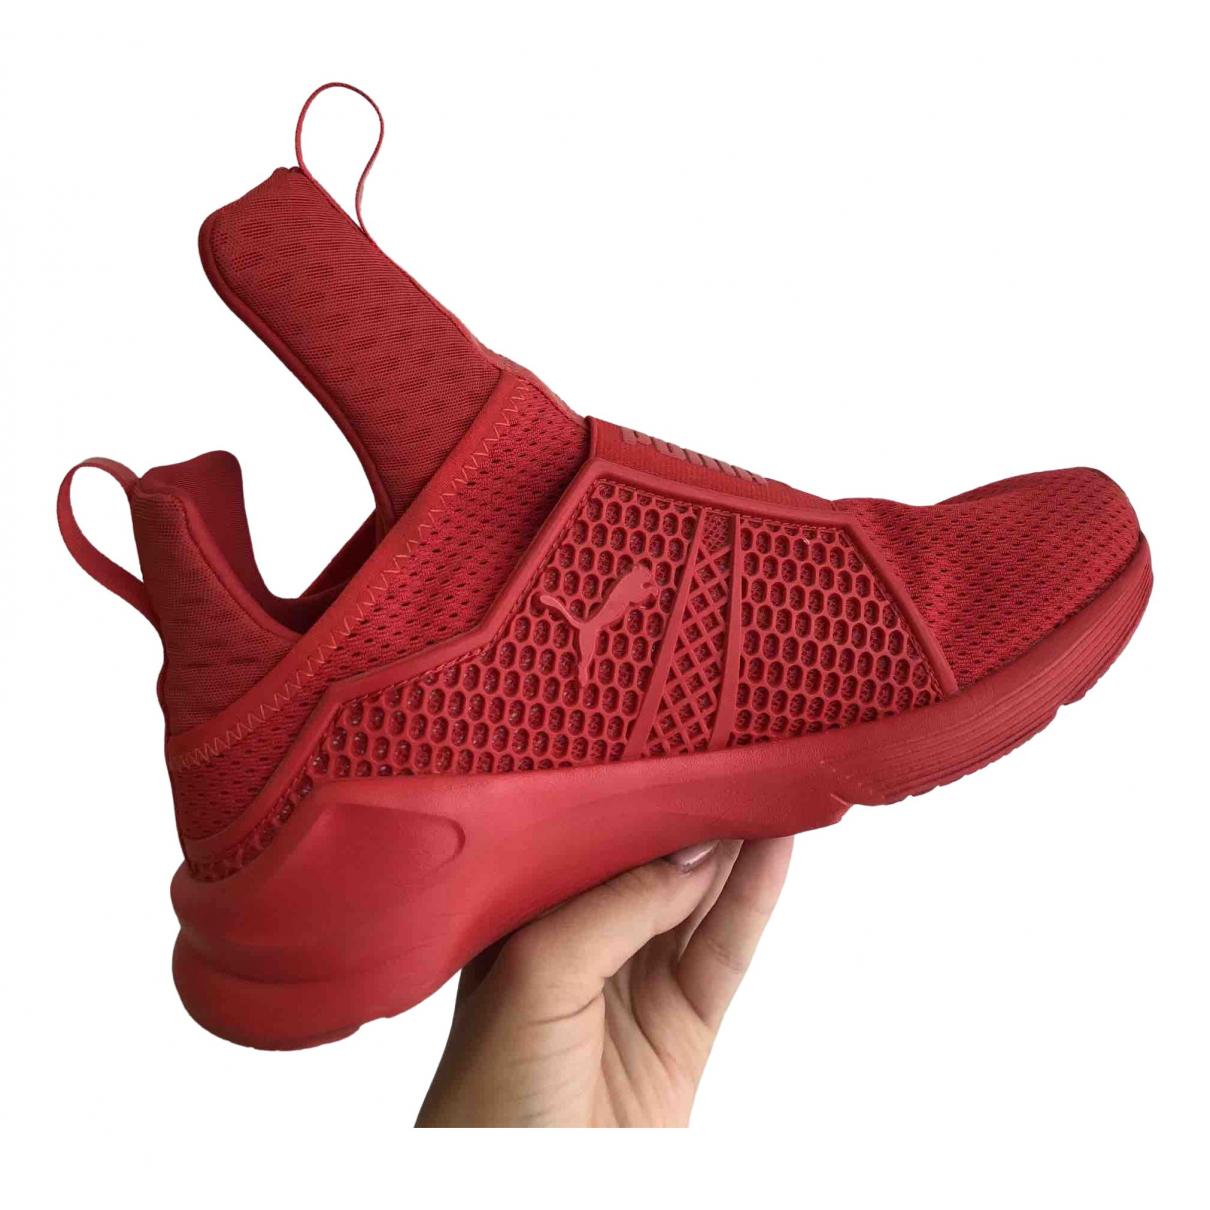 Fenty X Puma \N Red Cloth Trainers for Women 5.5 UK